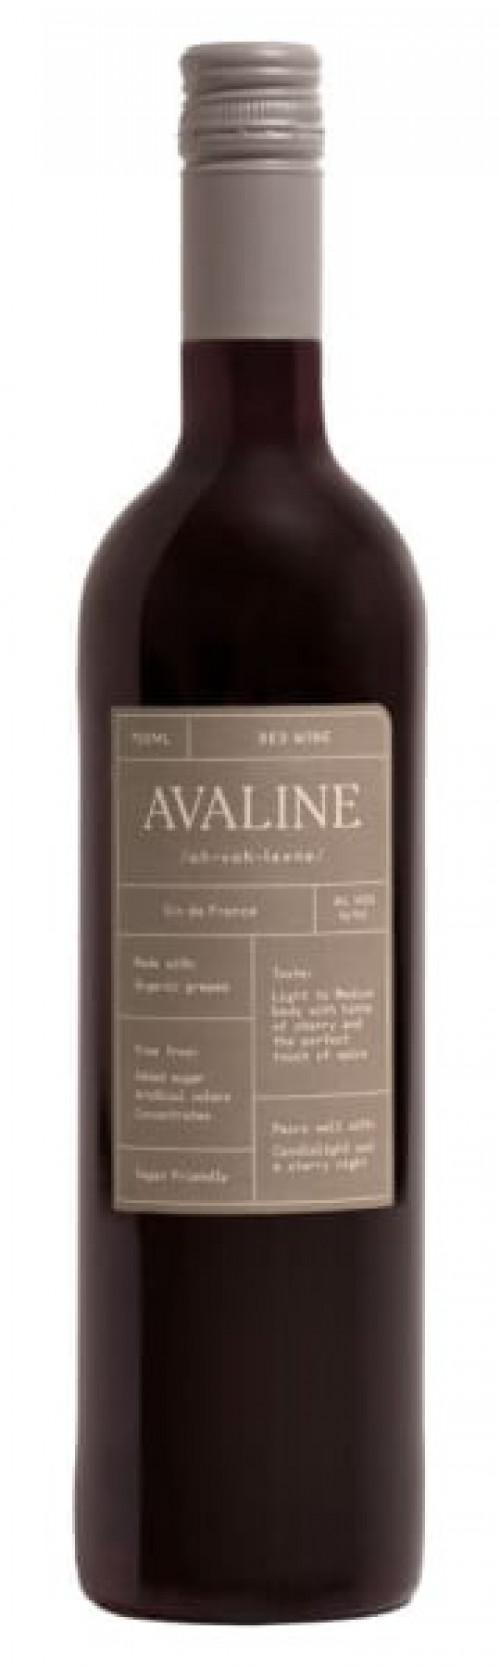 Avaline Red Wine 750ml NV